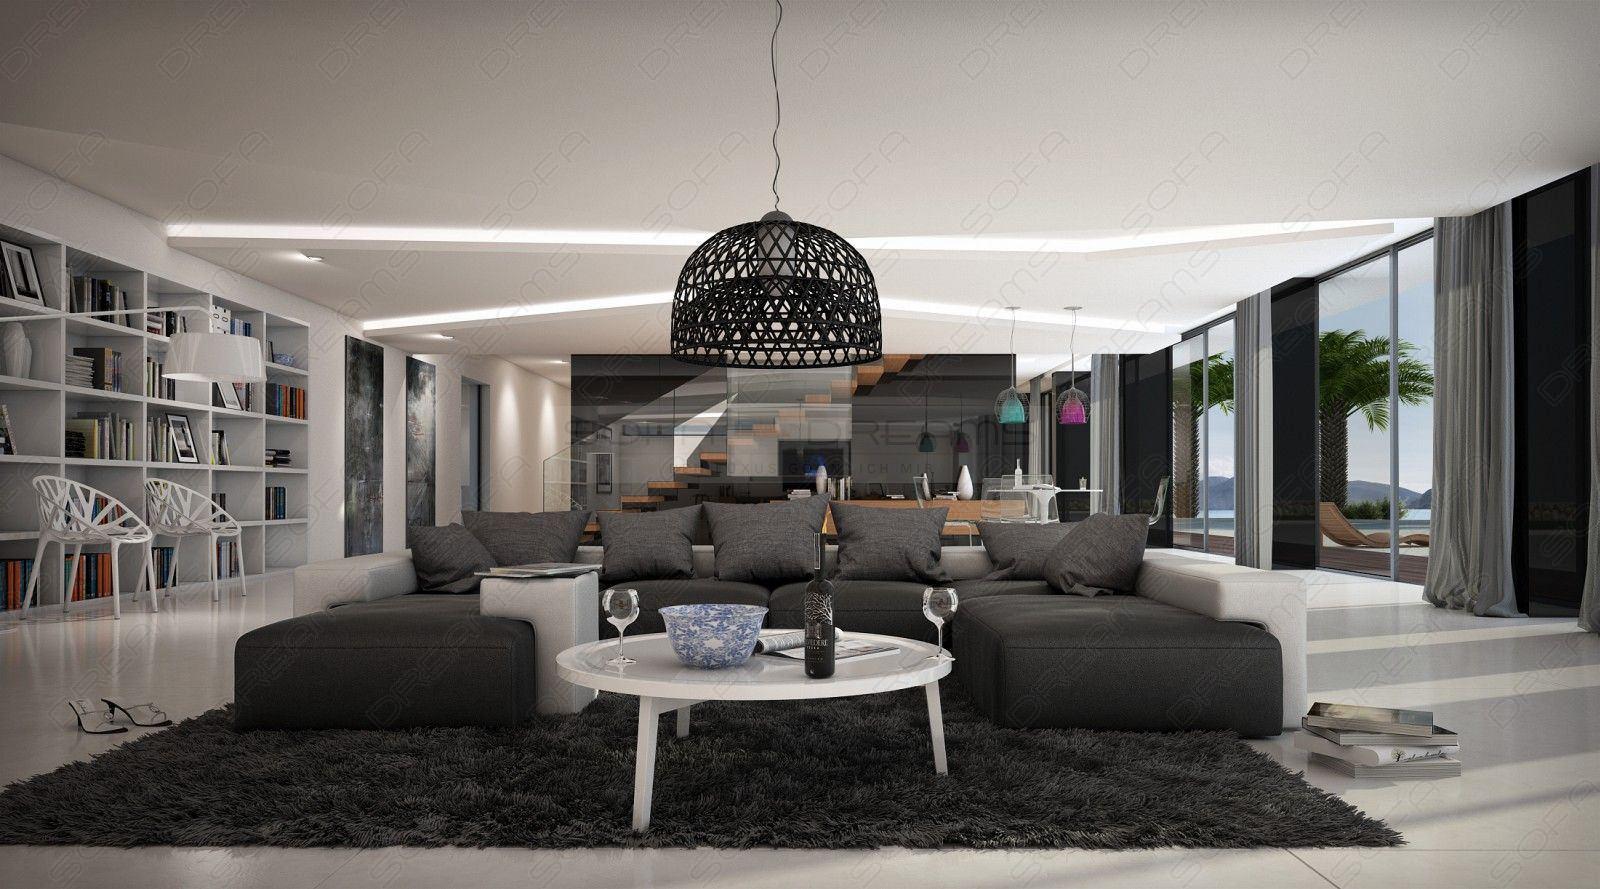 Wohnlandschaft saheel u form sofa design couch ecksofa for Grande marque de canape